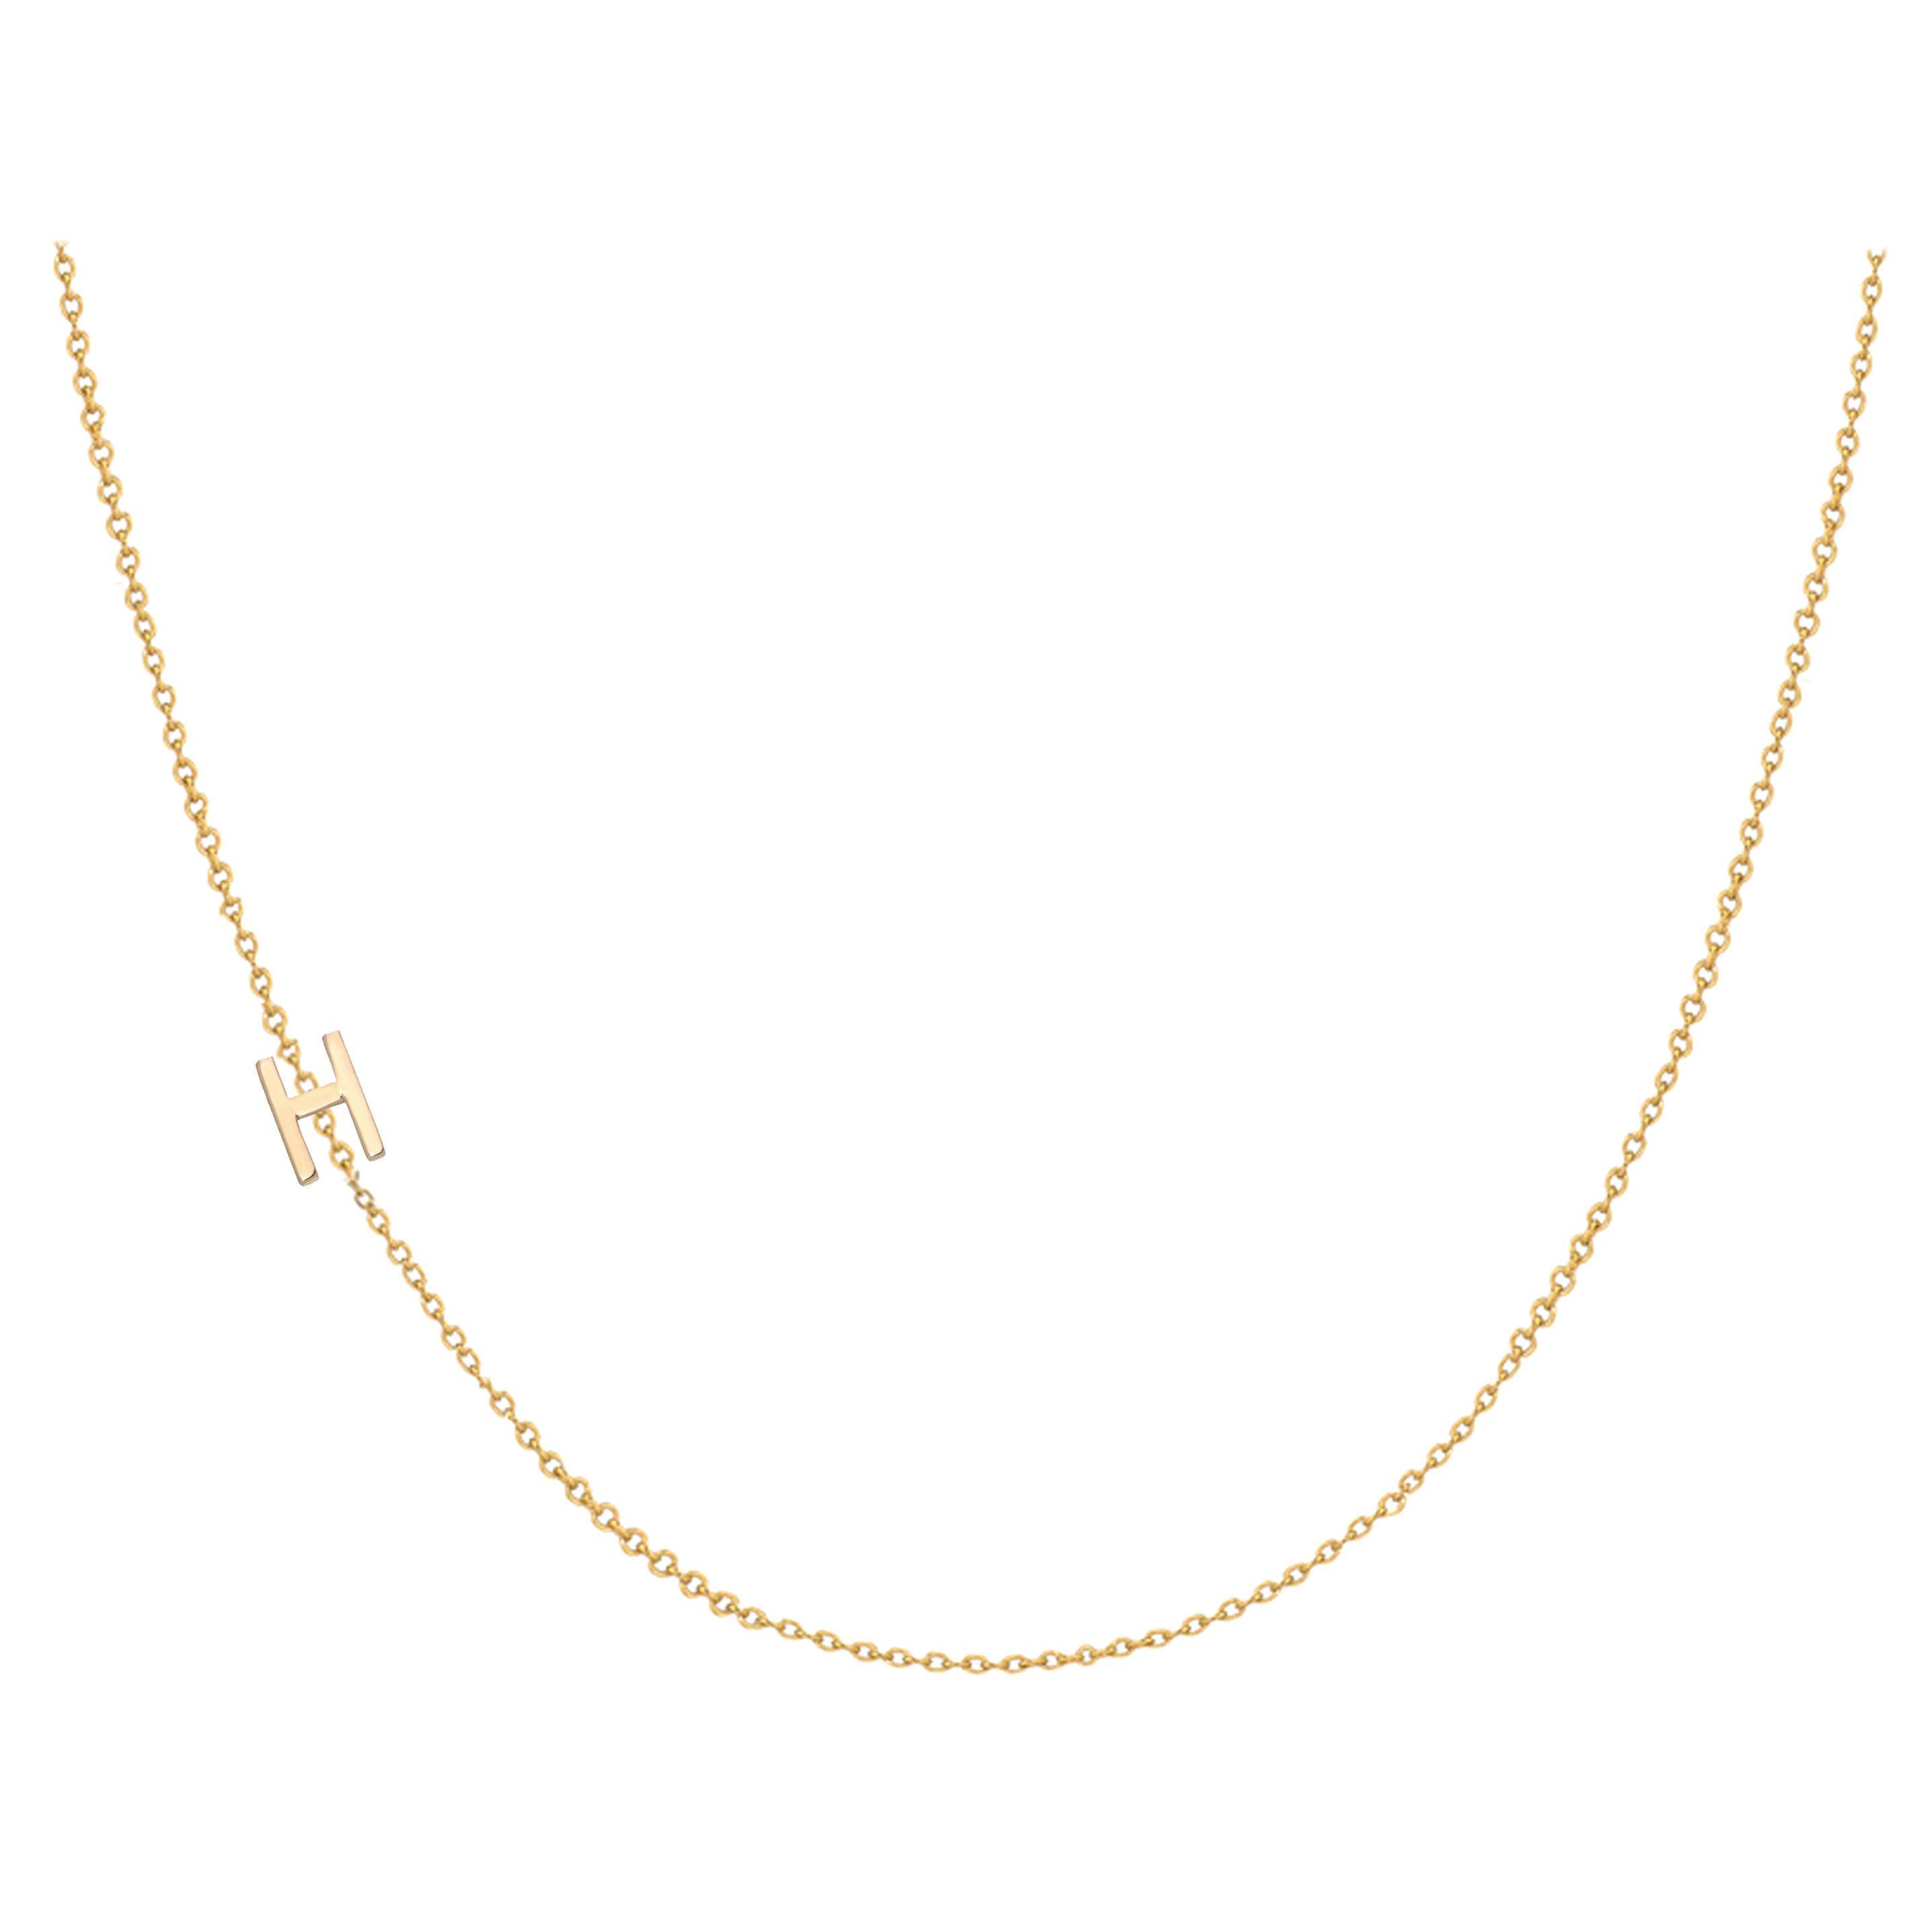 14 Karat Gold Asymmetrical Initial Necklace, H